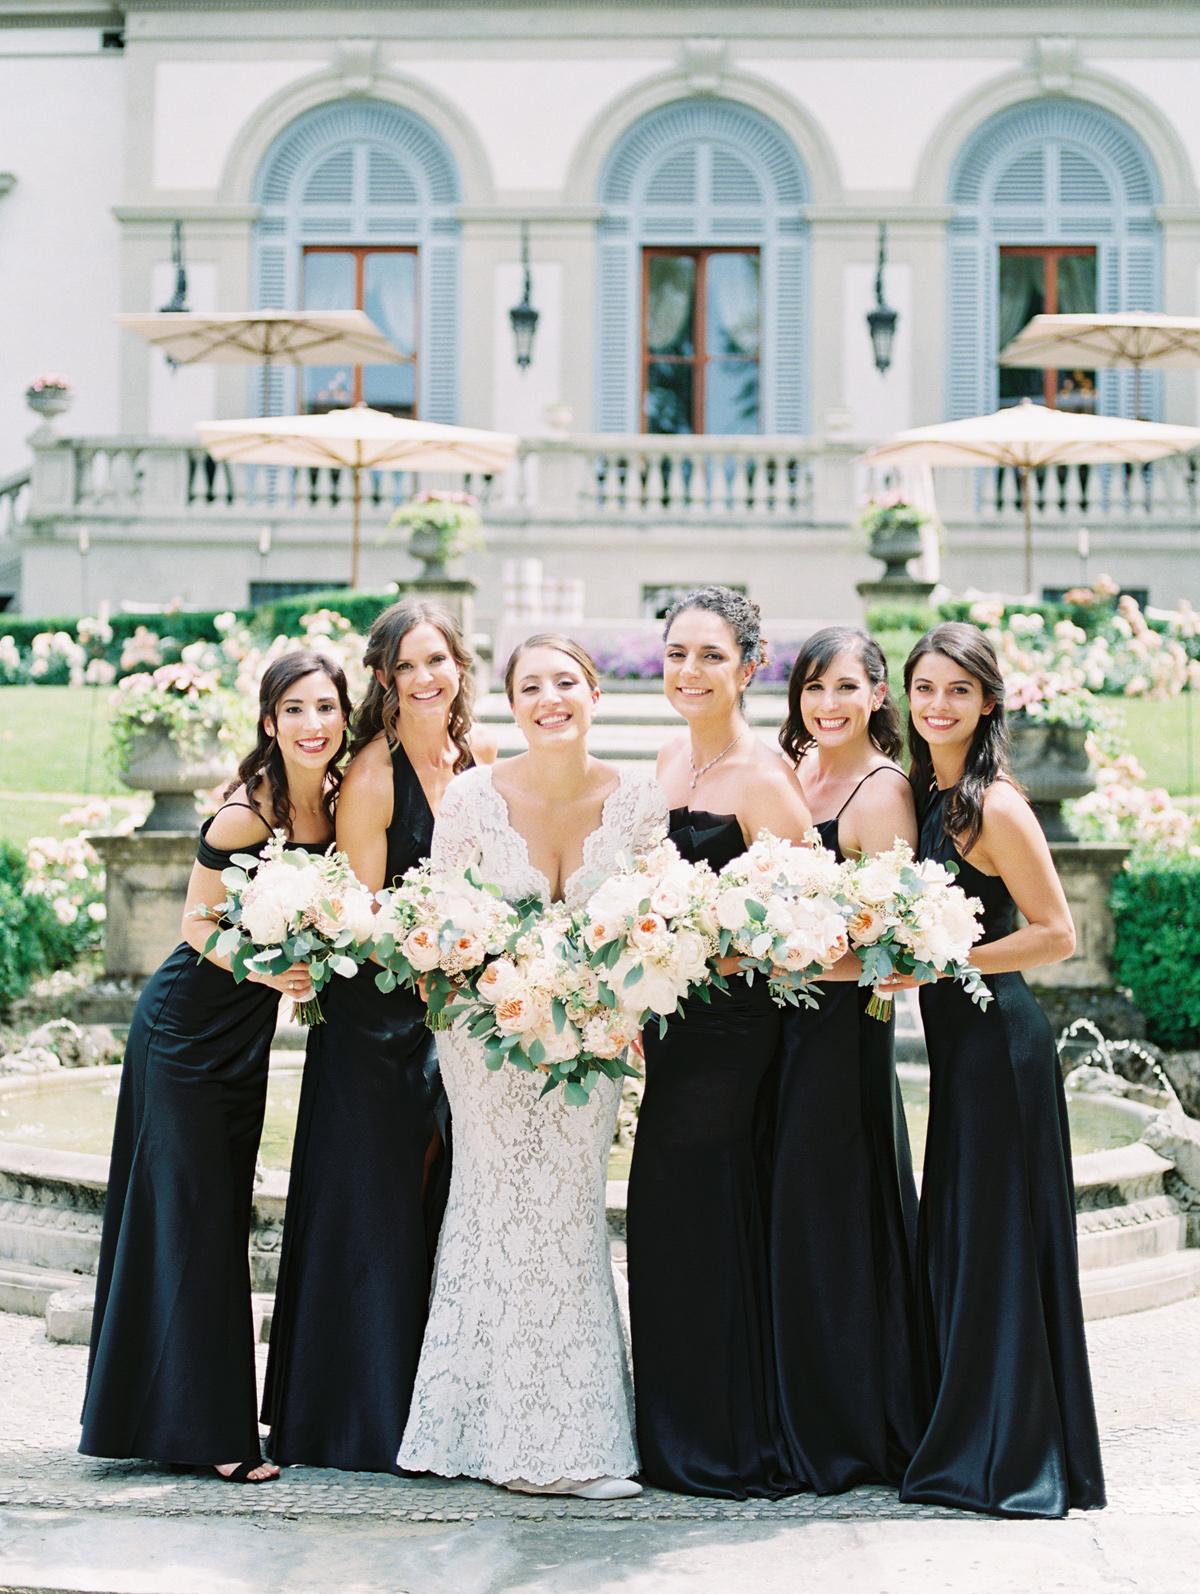 saghar ben wedding bridal party in black